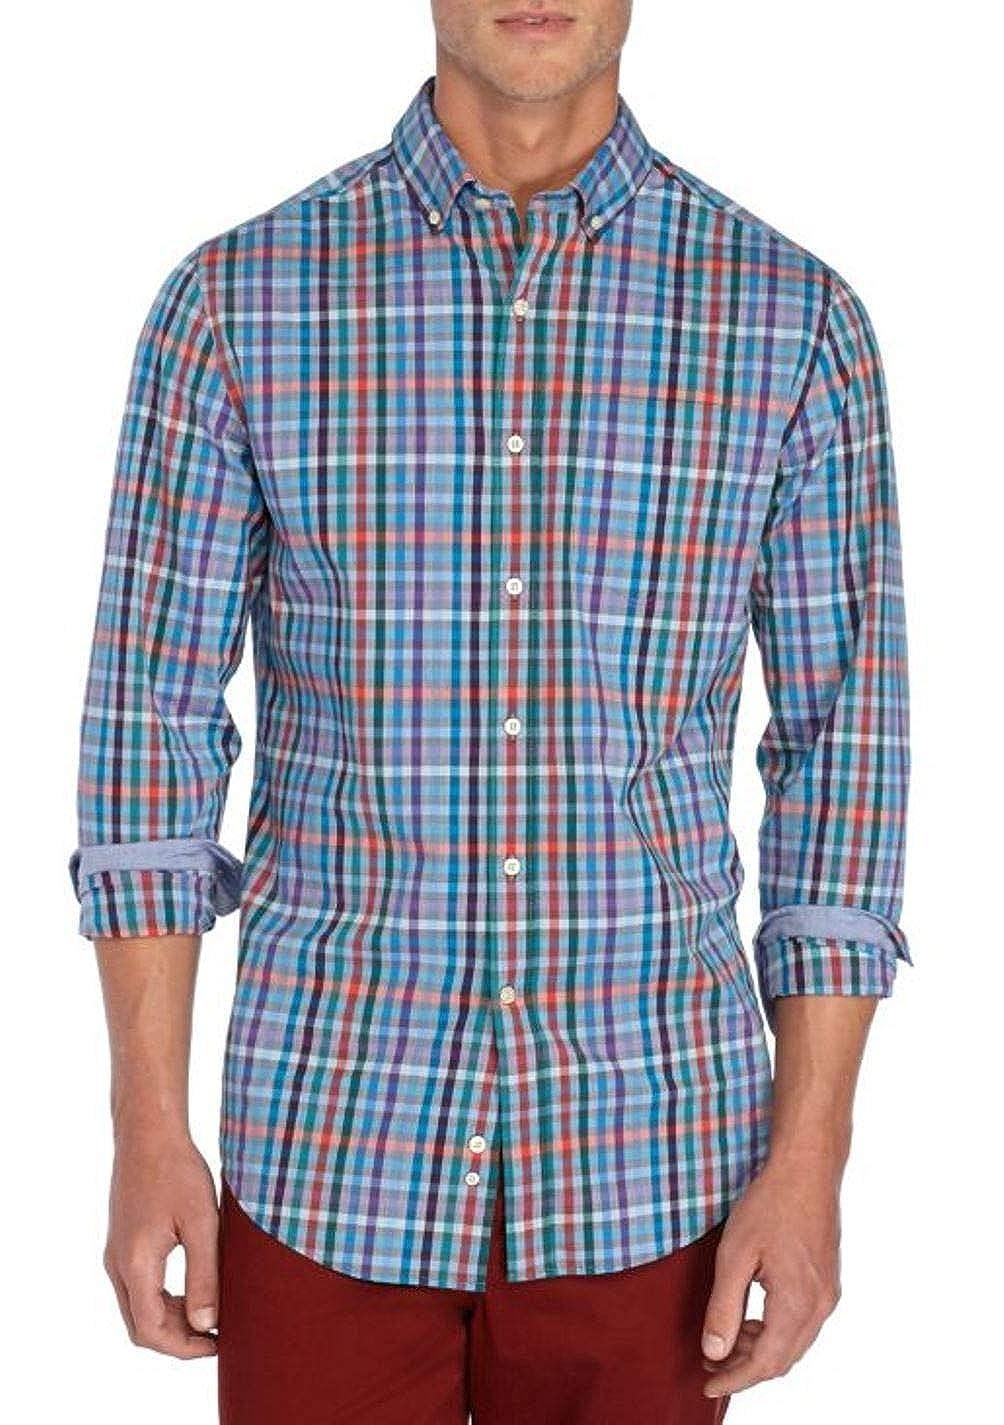 Crown /& Ivy Mens Big /& Tall Long Sleeve Stretch Medium Plaid Shirt